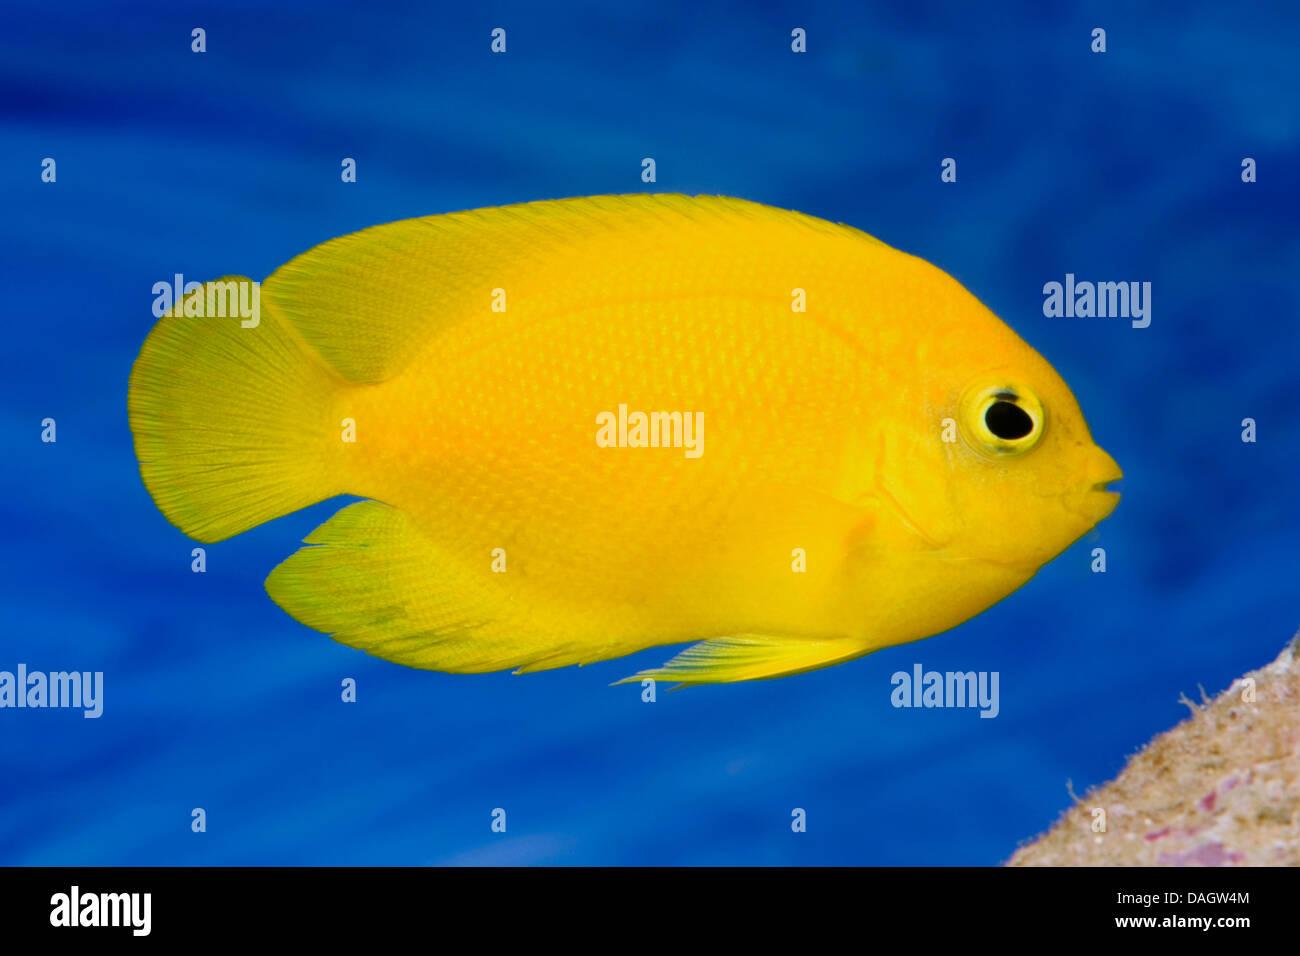 b5e36149ad Complementary Coloring Stock Photos & Complementary Coloring Stock ...